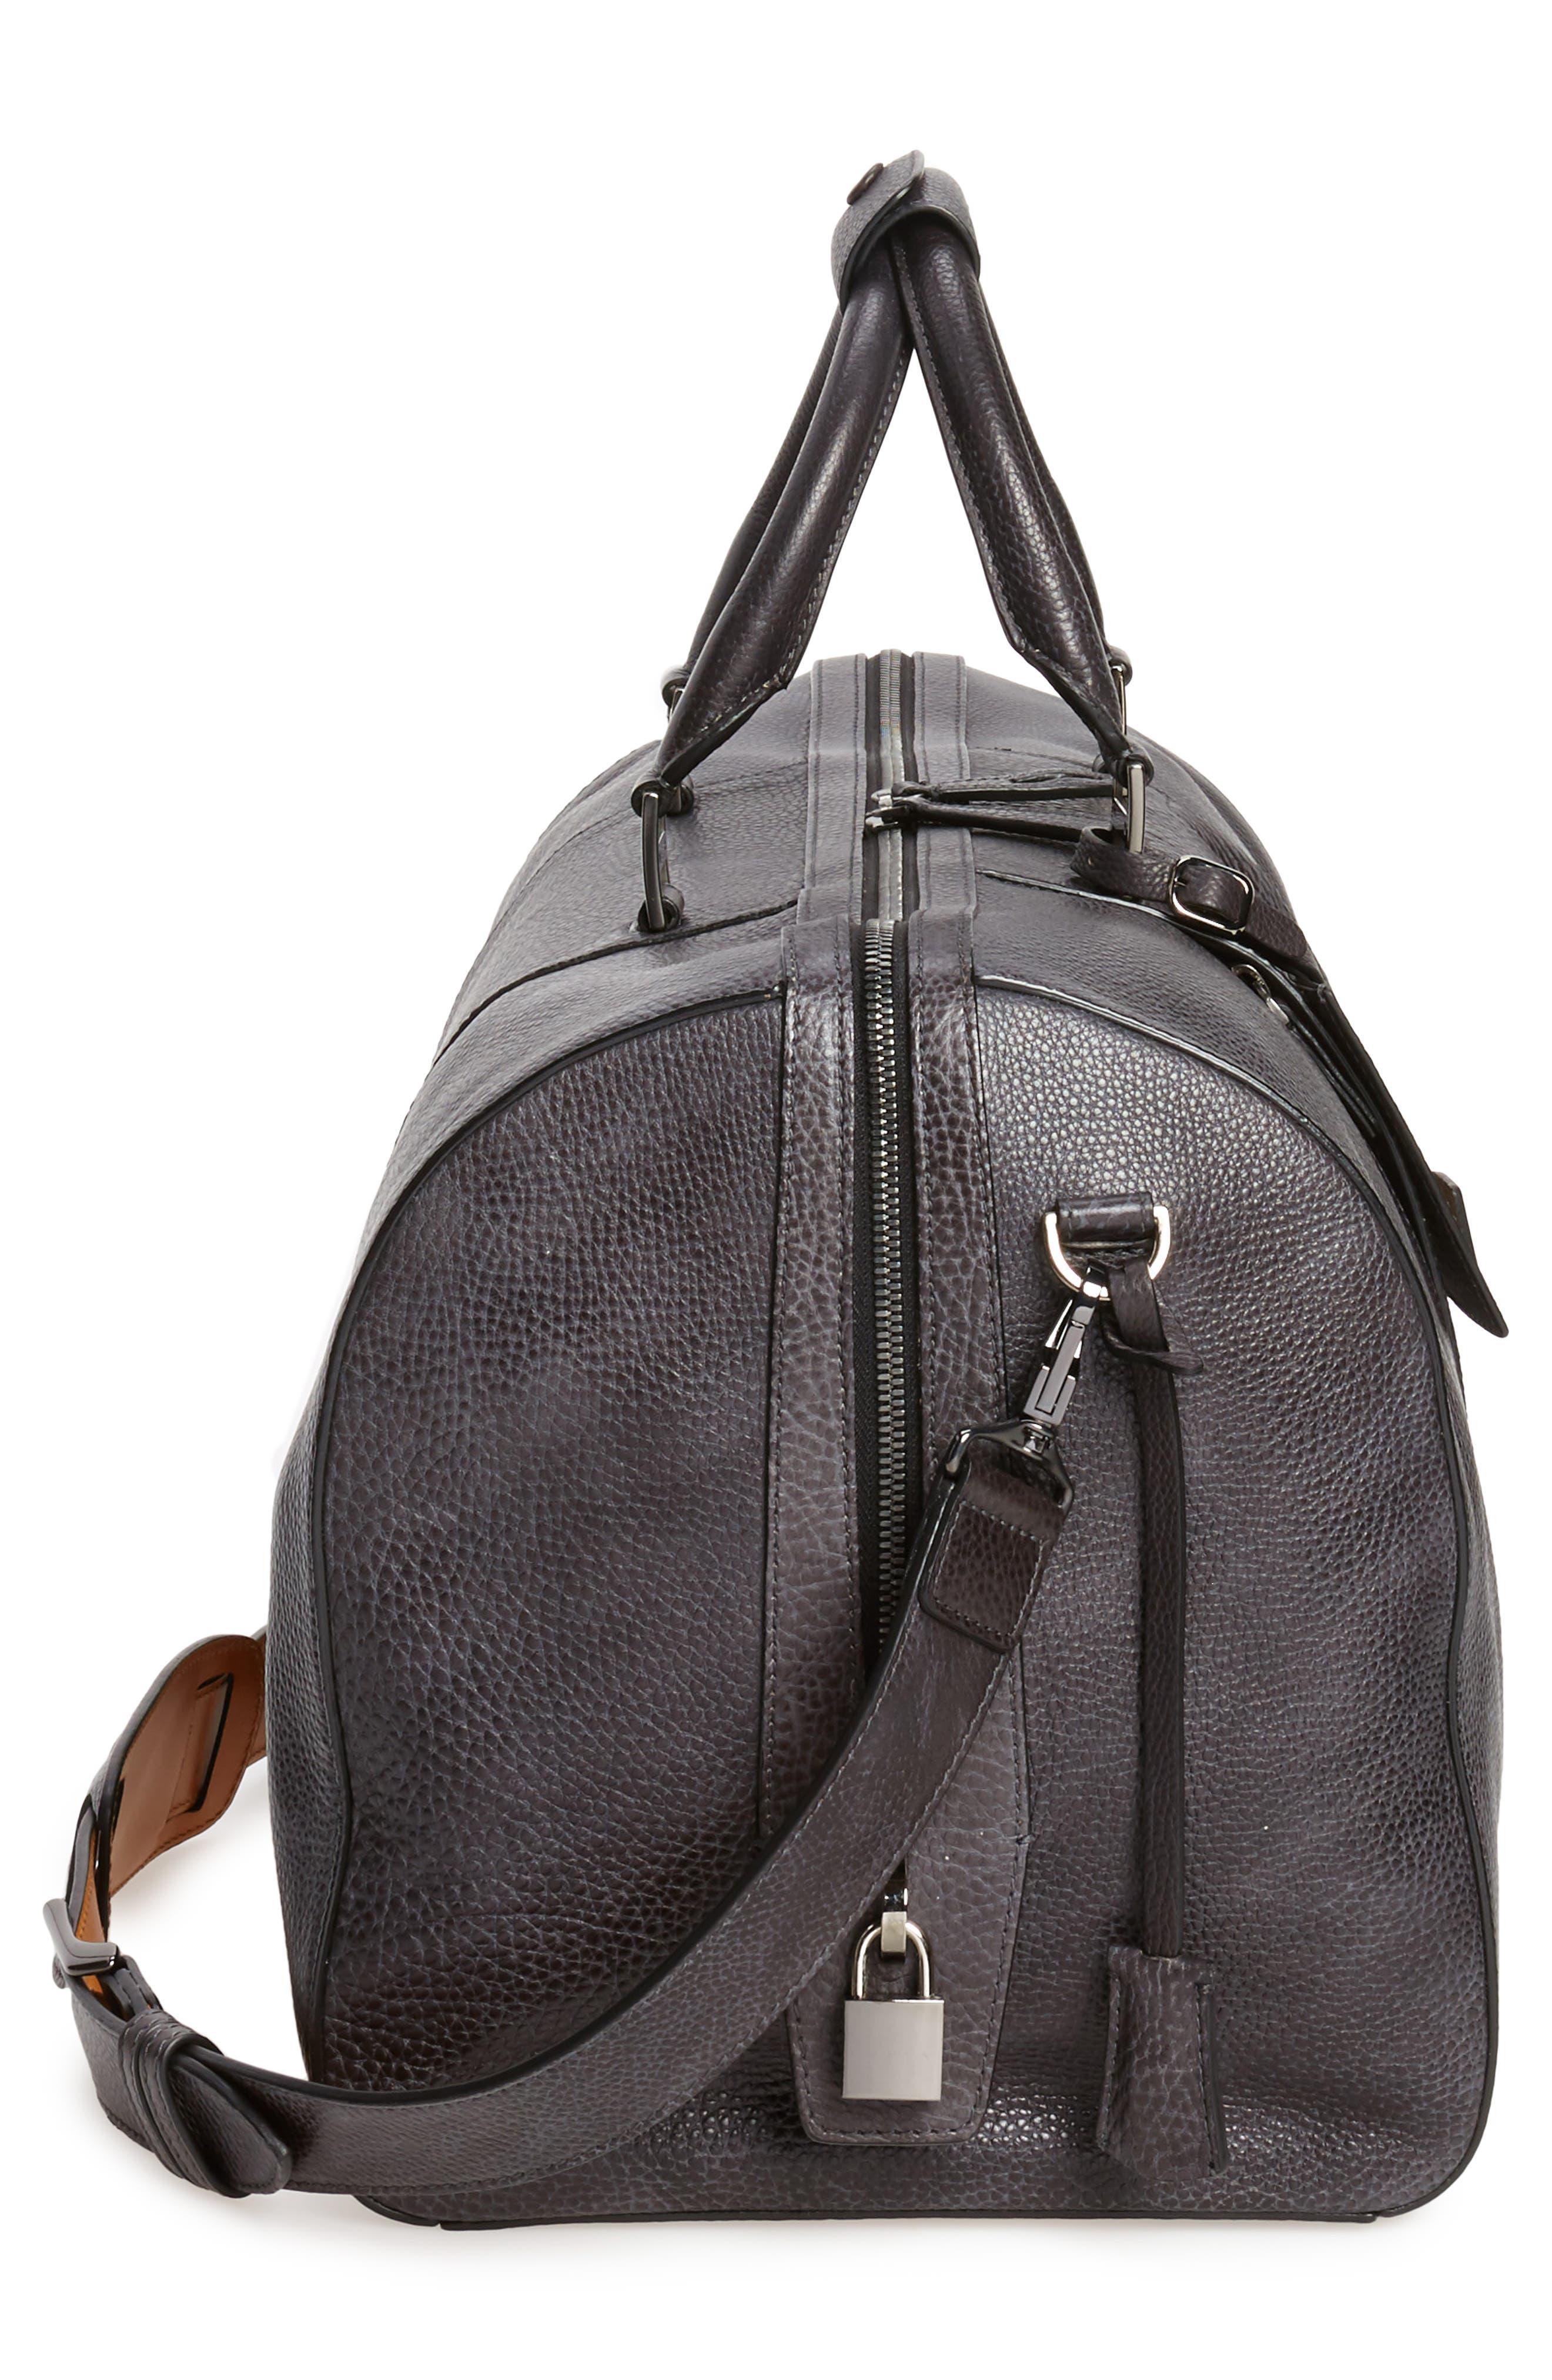 Traveler Leather Duffel Bag,                             Alternate thumbnail 5, color,                             020